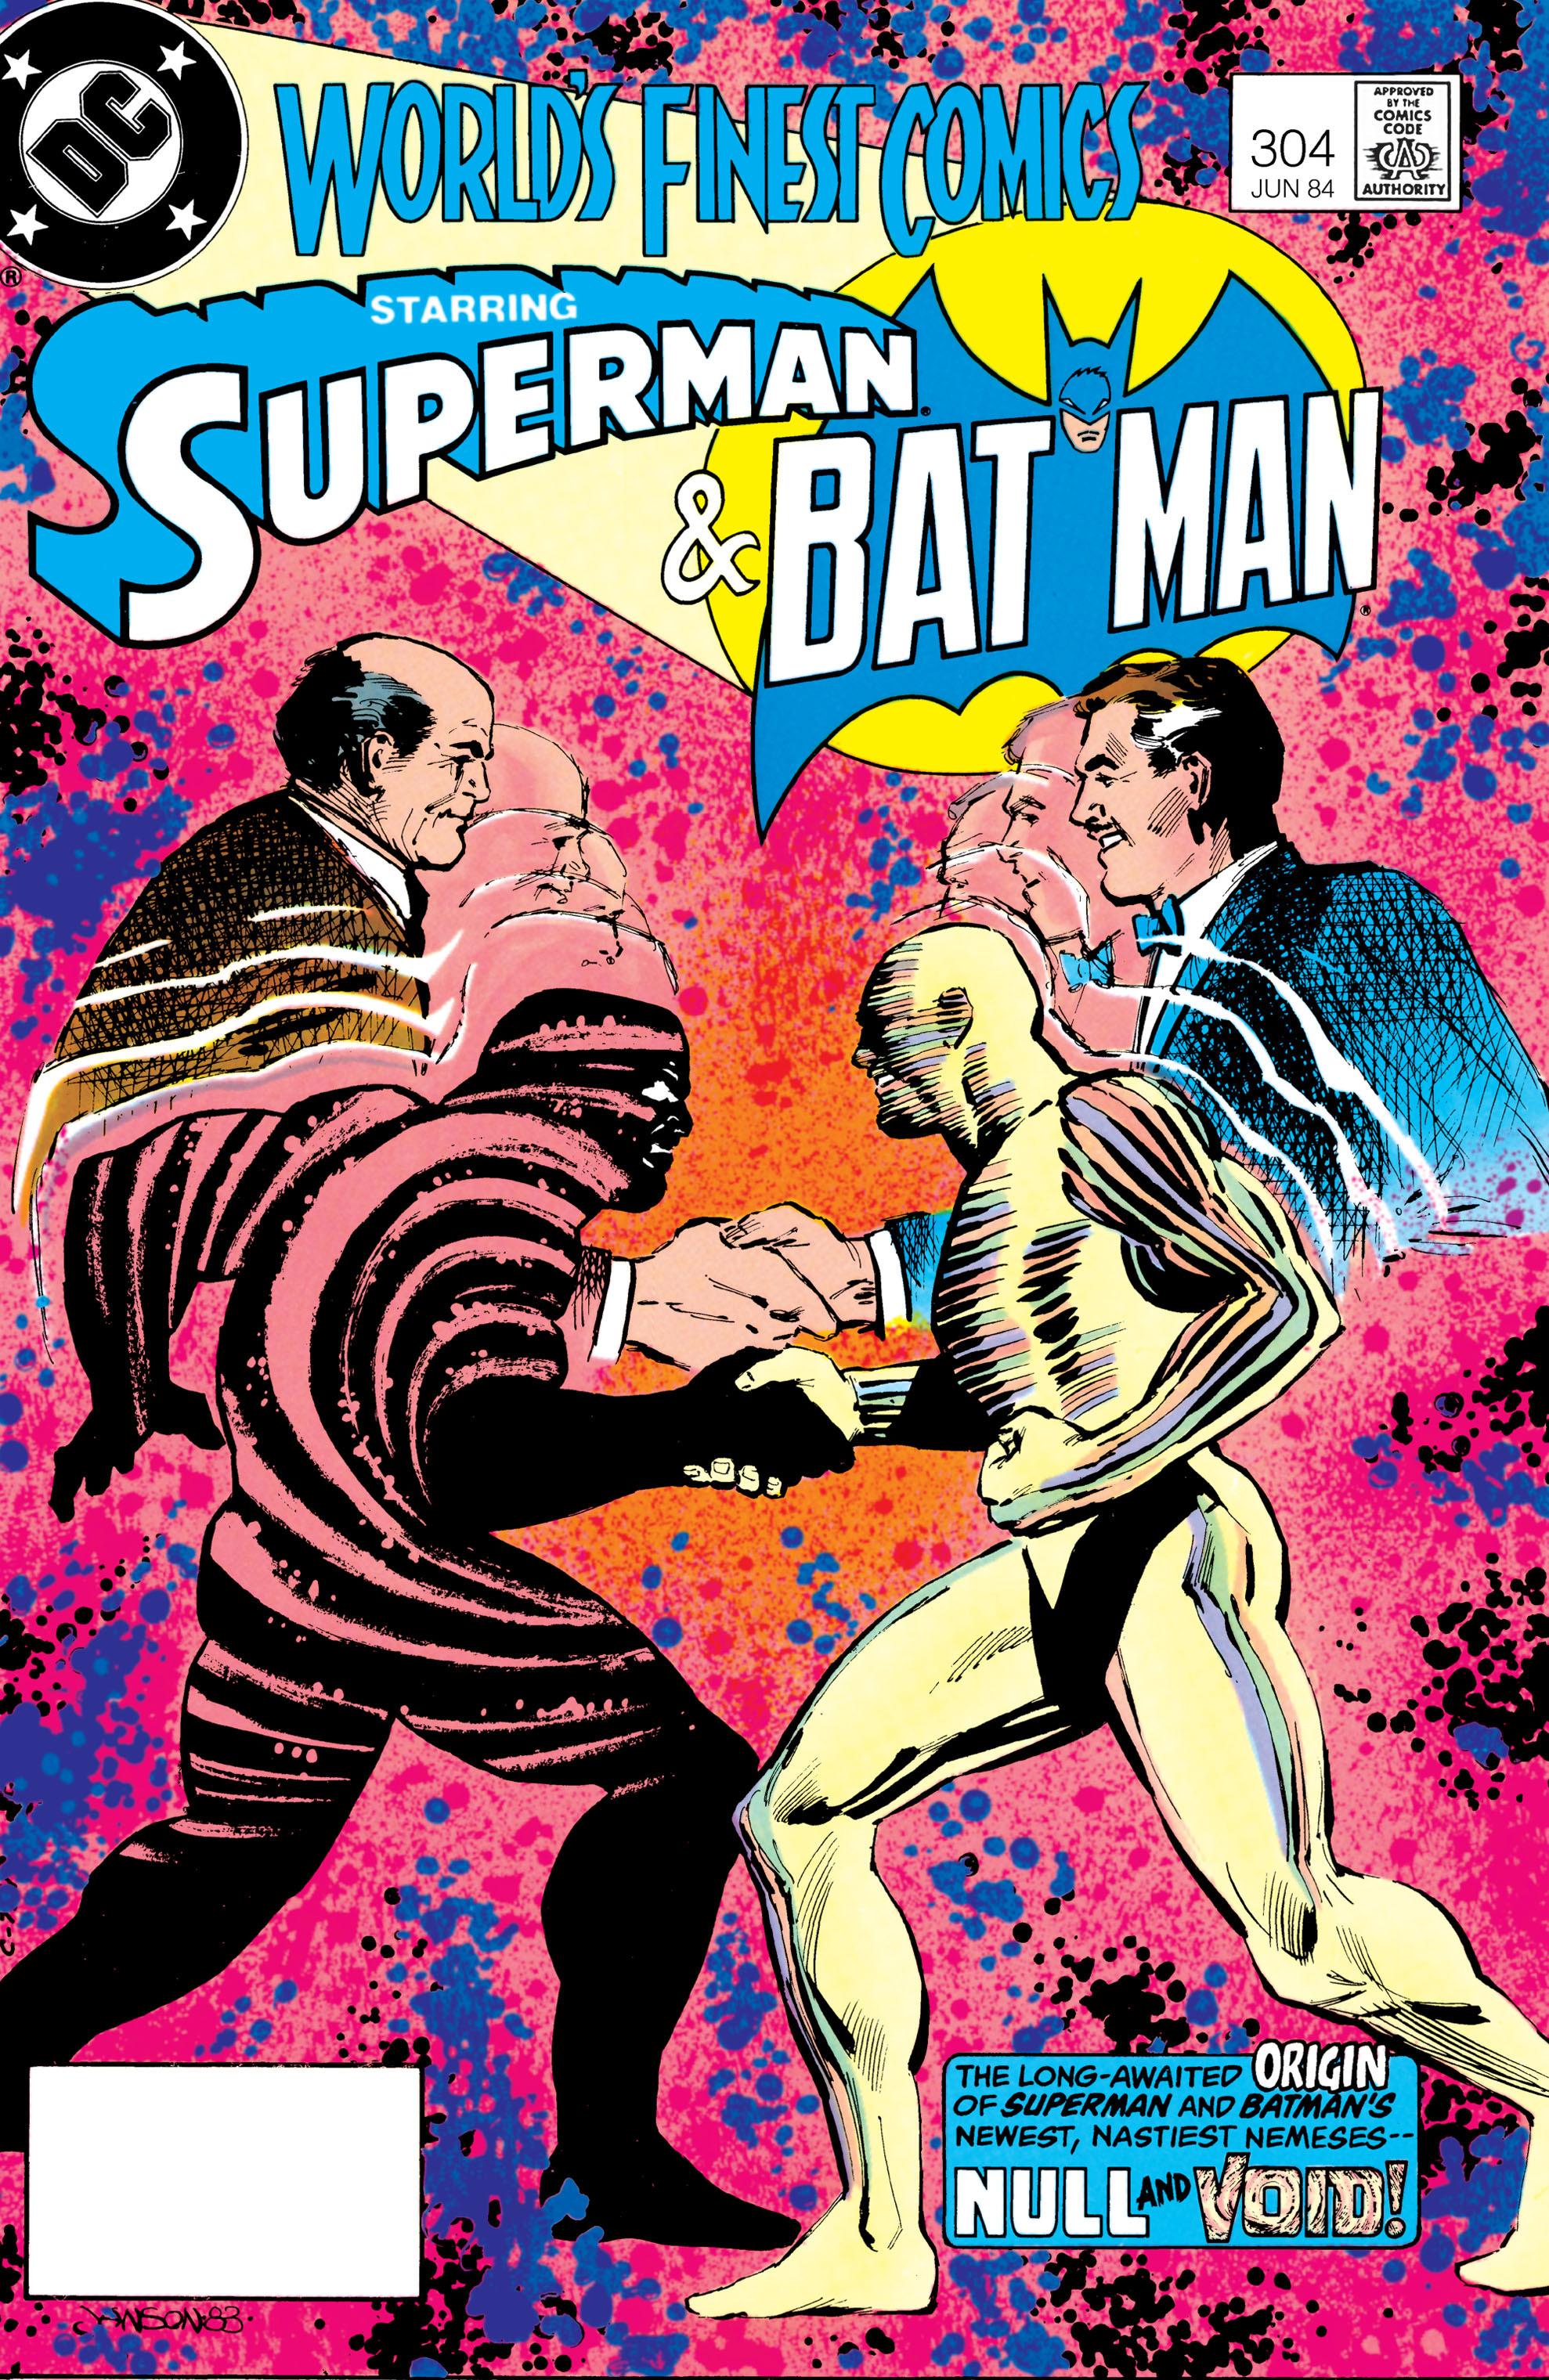 Read online World's Finest Comics comic -  Issue #304 - 1